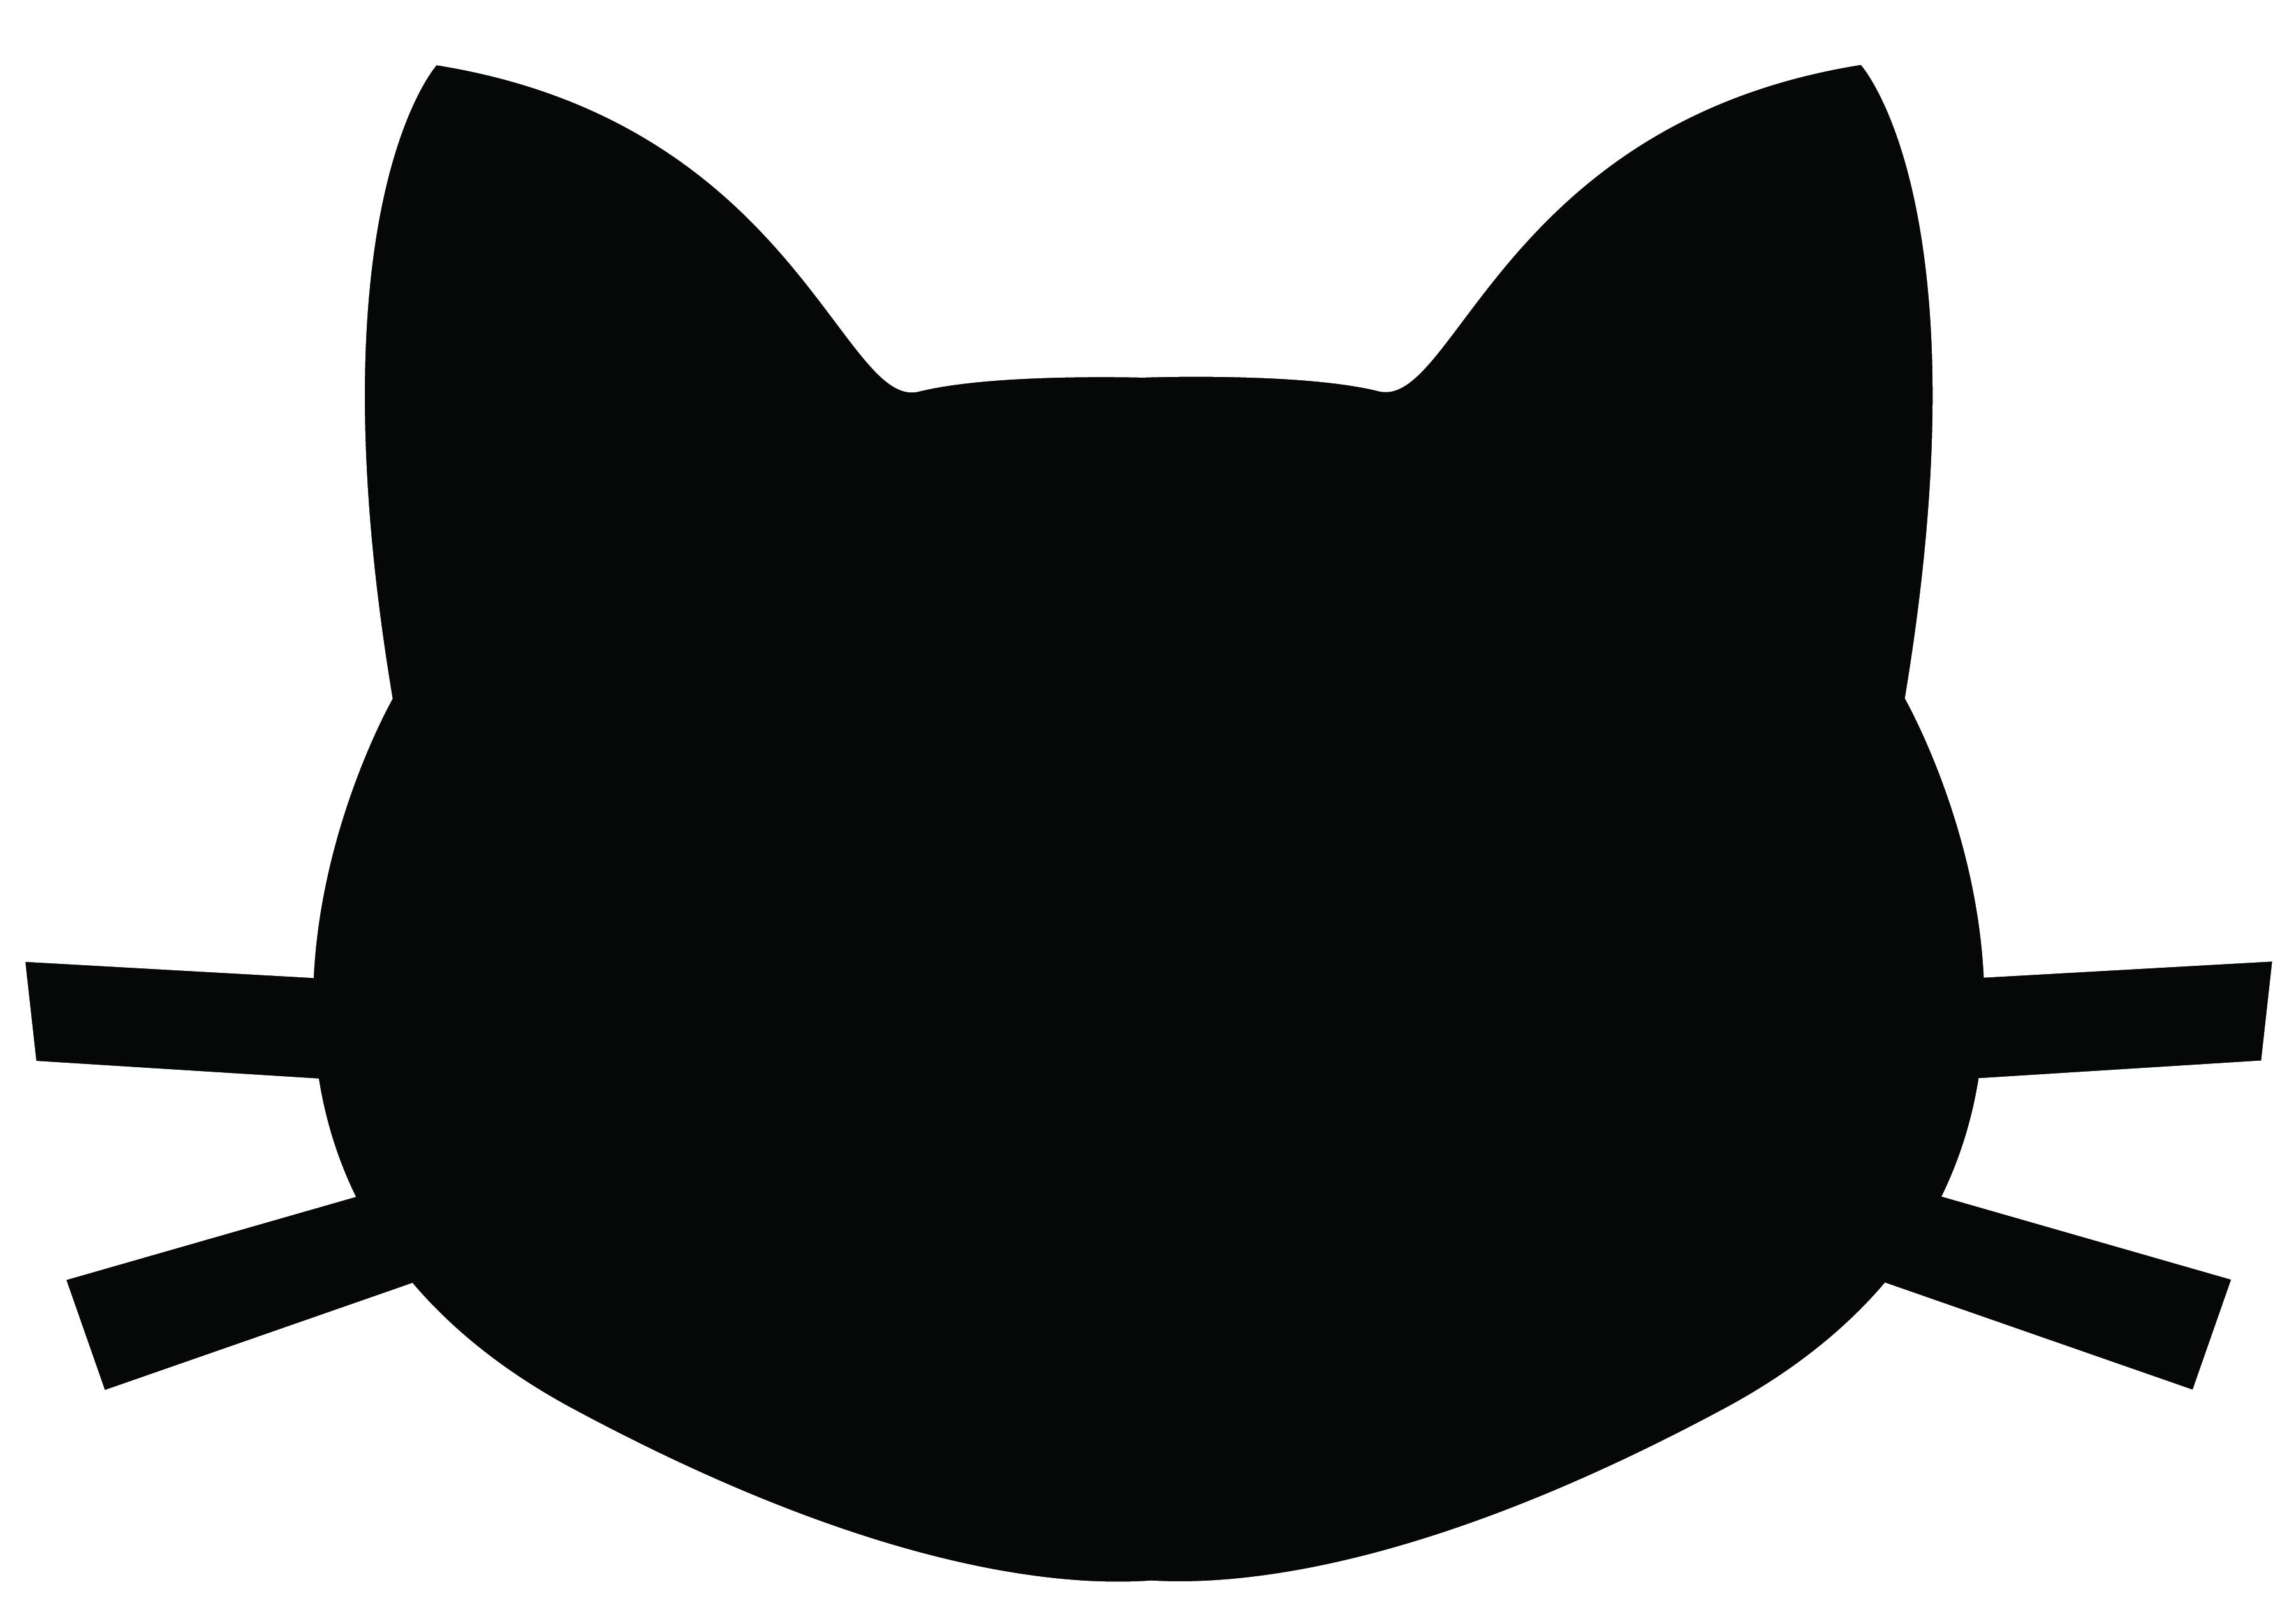 3600x2538 Black Cat Silhouette Clipart